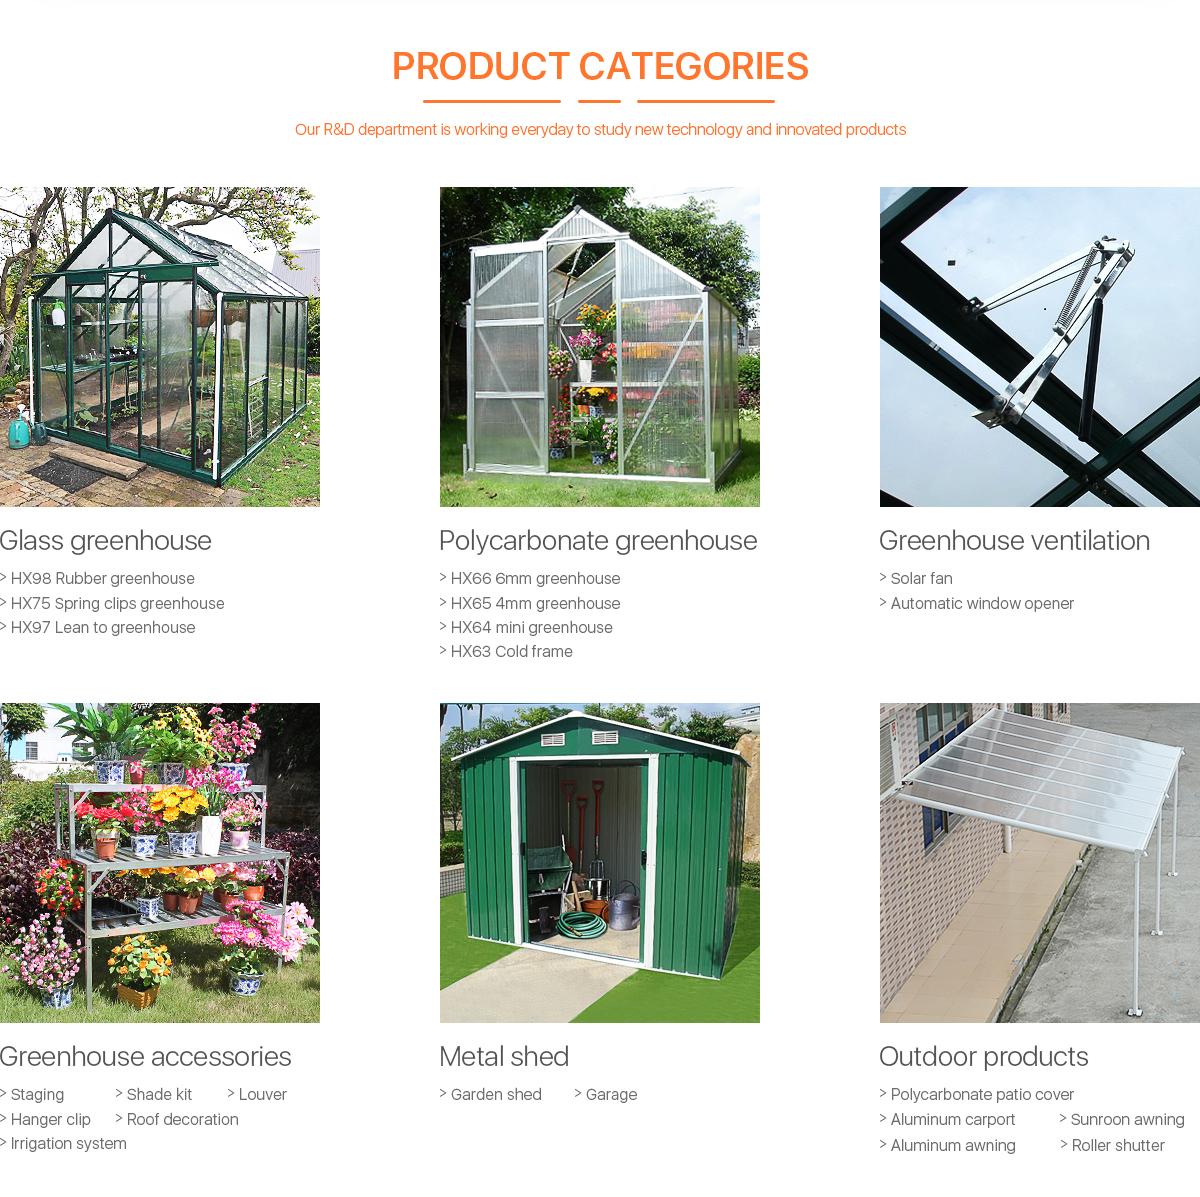 Huixin Metal Products Co., Ltd. - Greenhouse, Window Opener